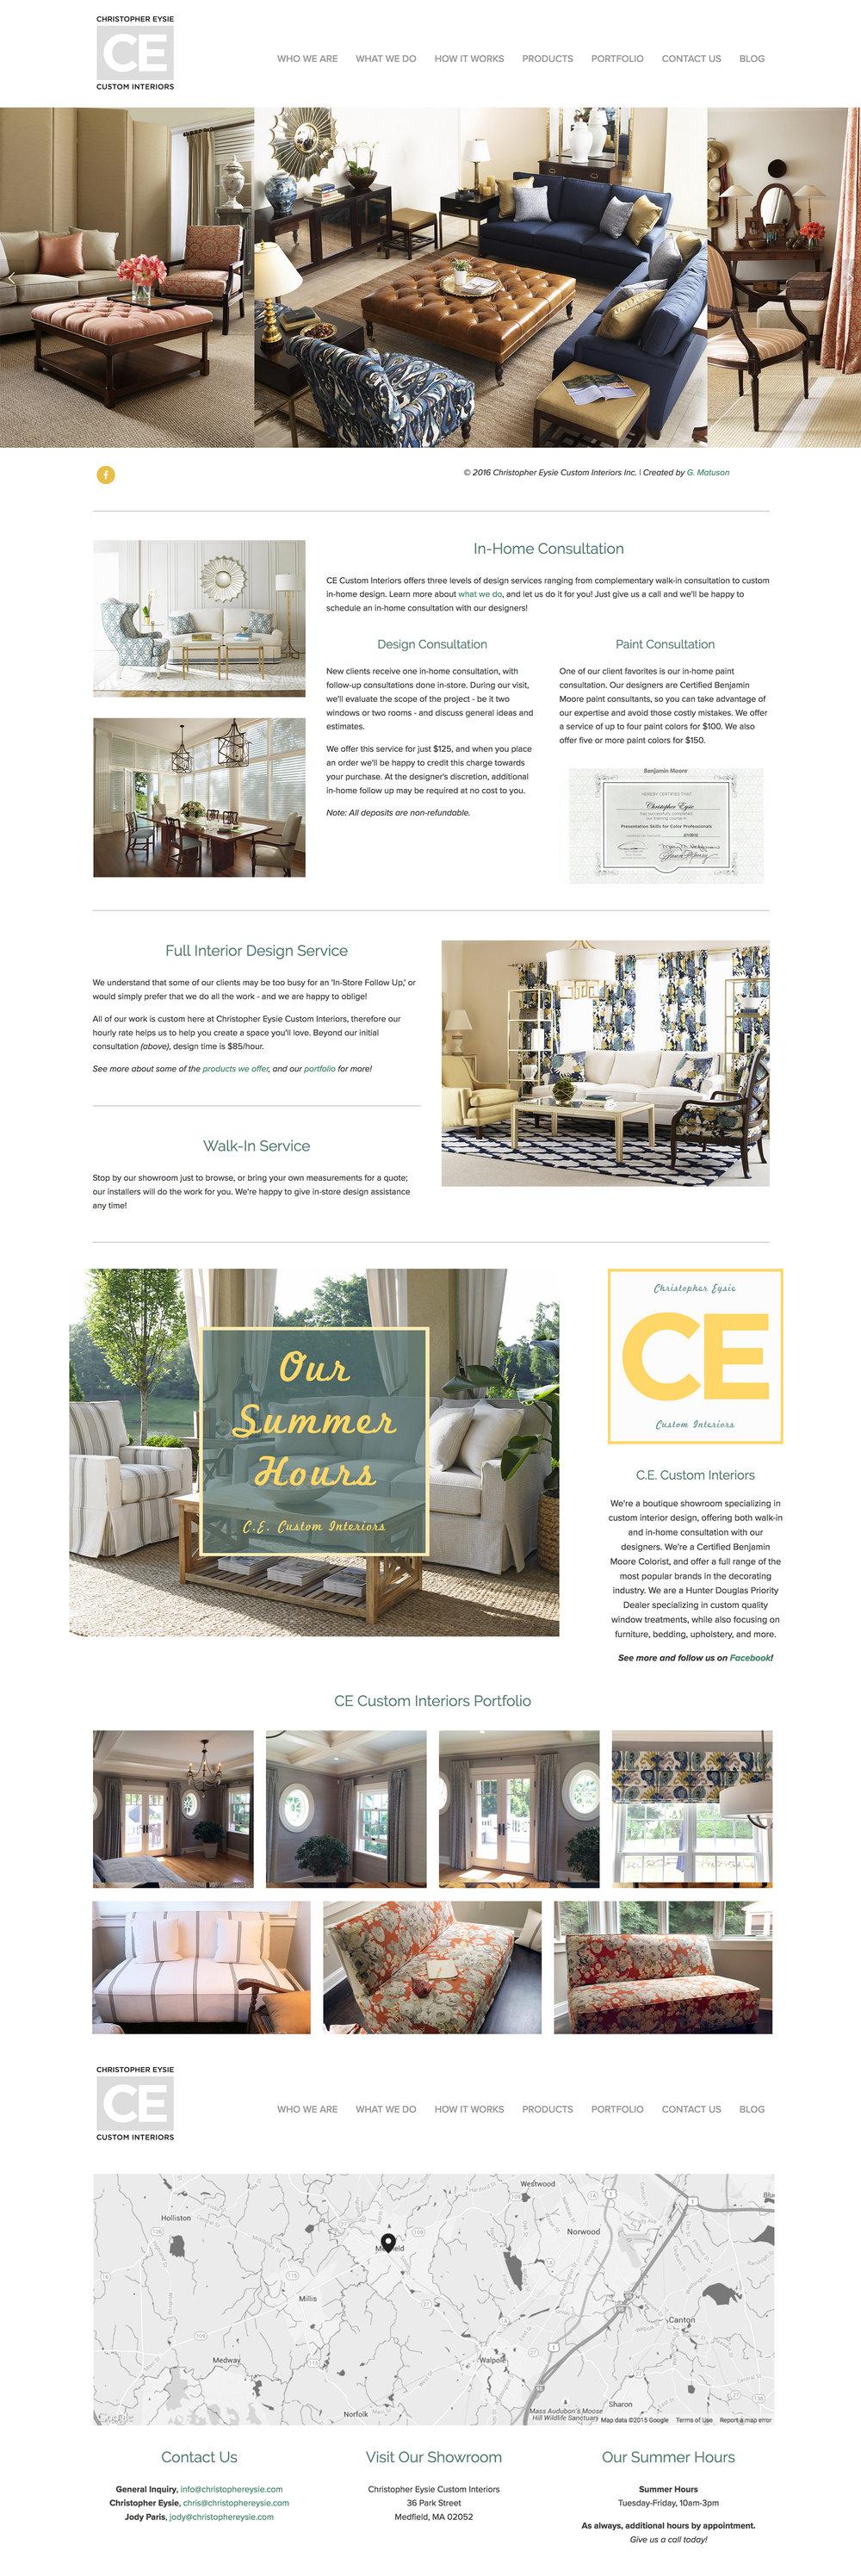 Overview of Christopher Eysie Custom Interiors website designed by Geena Matuson @geenamatuson #thegirlmirage